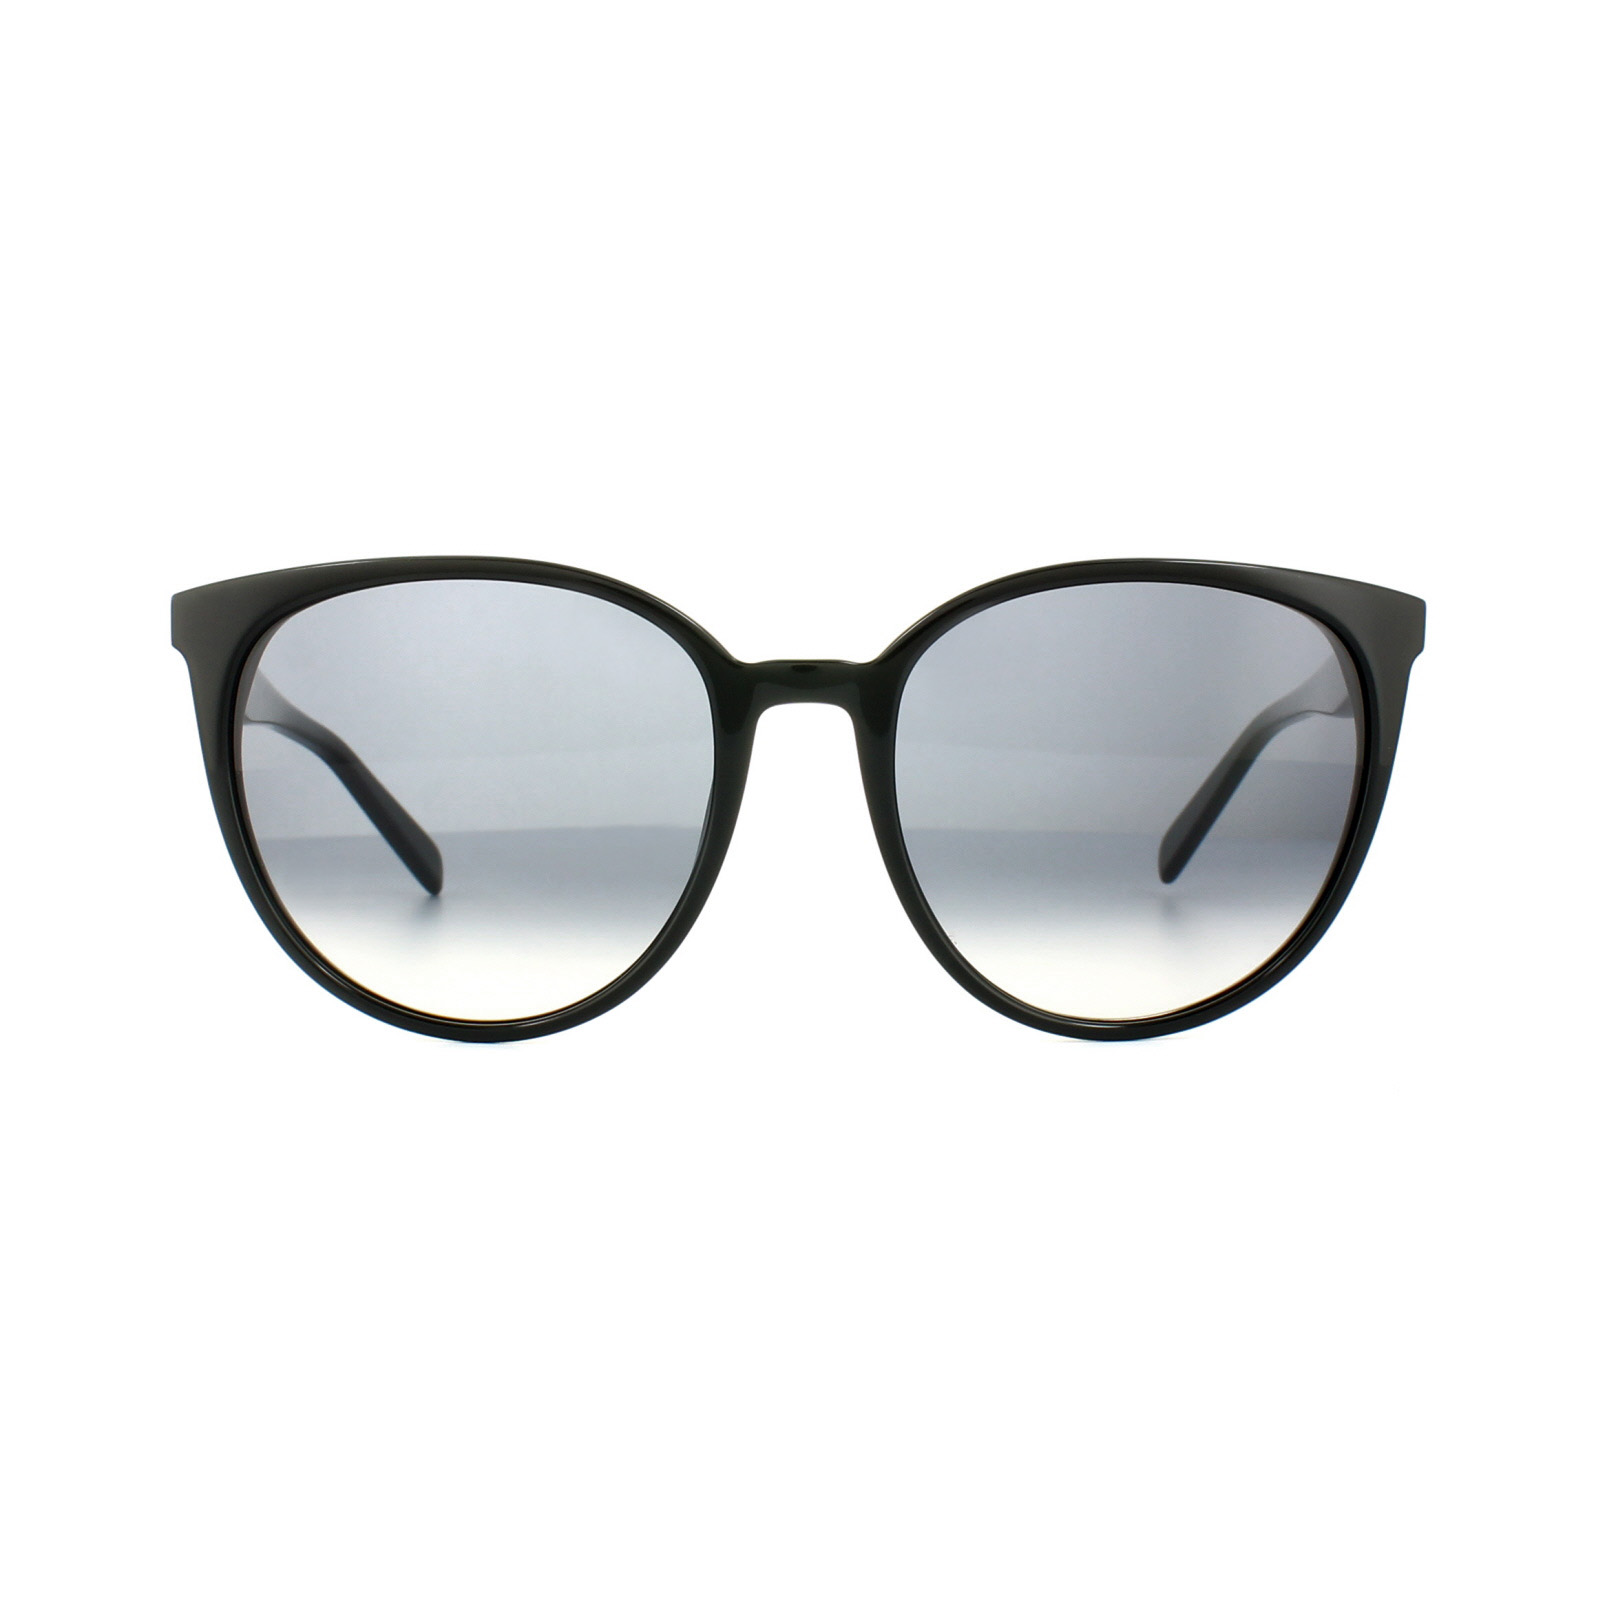 7d093f3a0d9b Cheap Celine 41068 S Thin Mary Sunglasses - Discounted Sunglasses